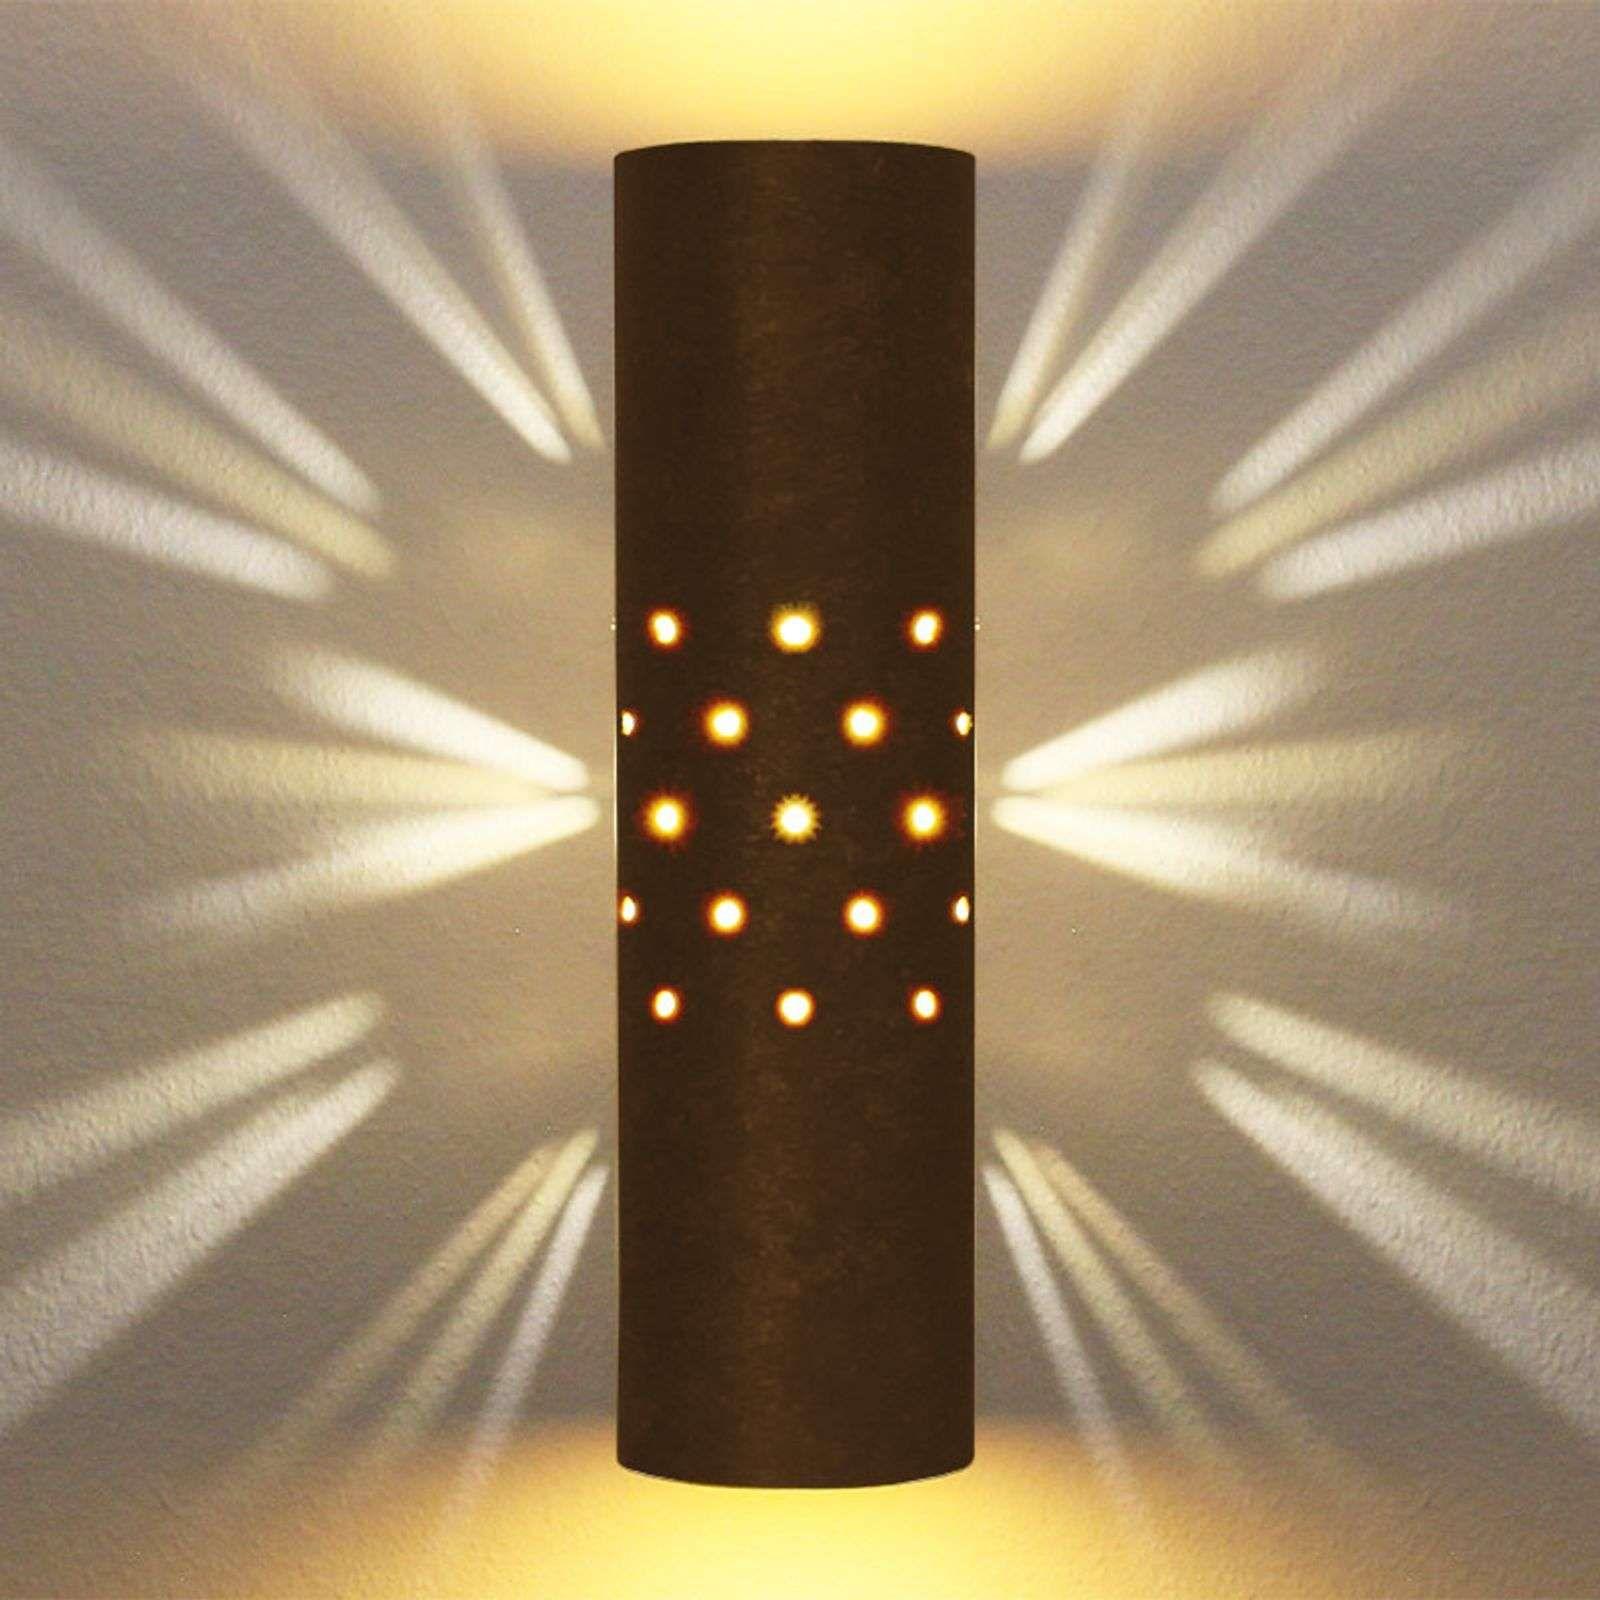 Led Hangeleuchte Cardito 156 Led Chrom Kristall L 70 Cm Spot Lampe Selber Bauen Wandleuchte Innen Gold In 2020 Wandleuchte Kronleuchter Gunstig Led Hangeleuchte